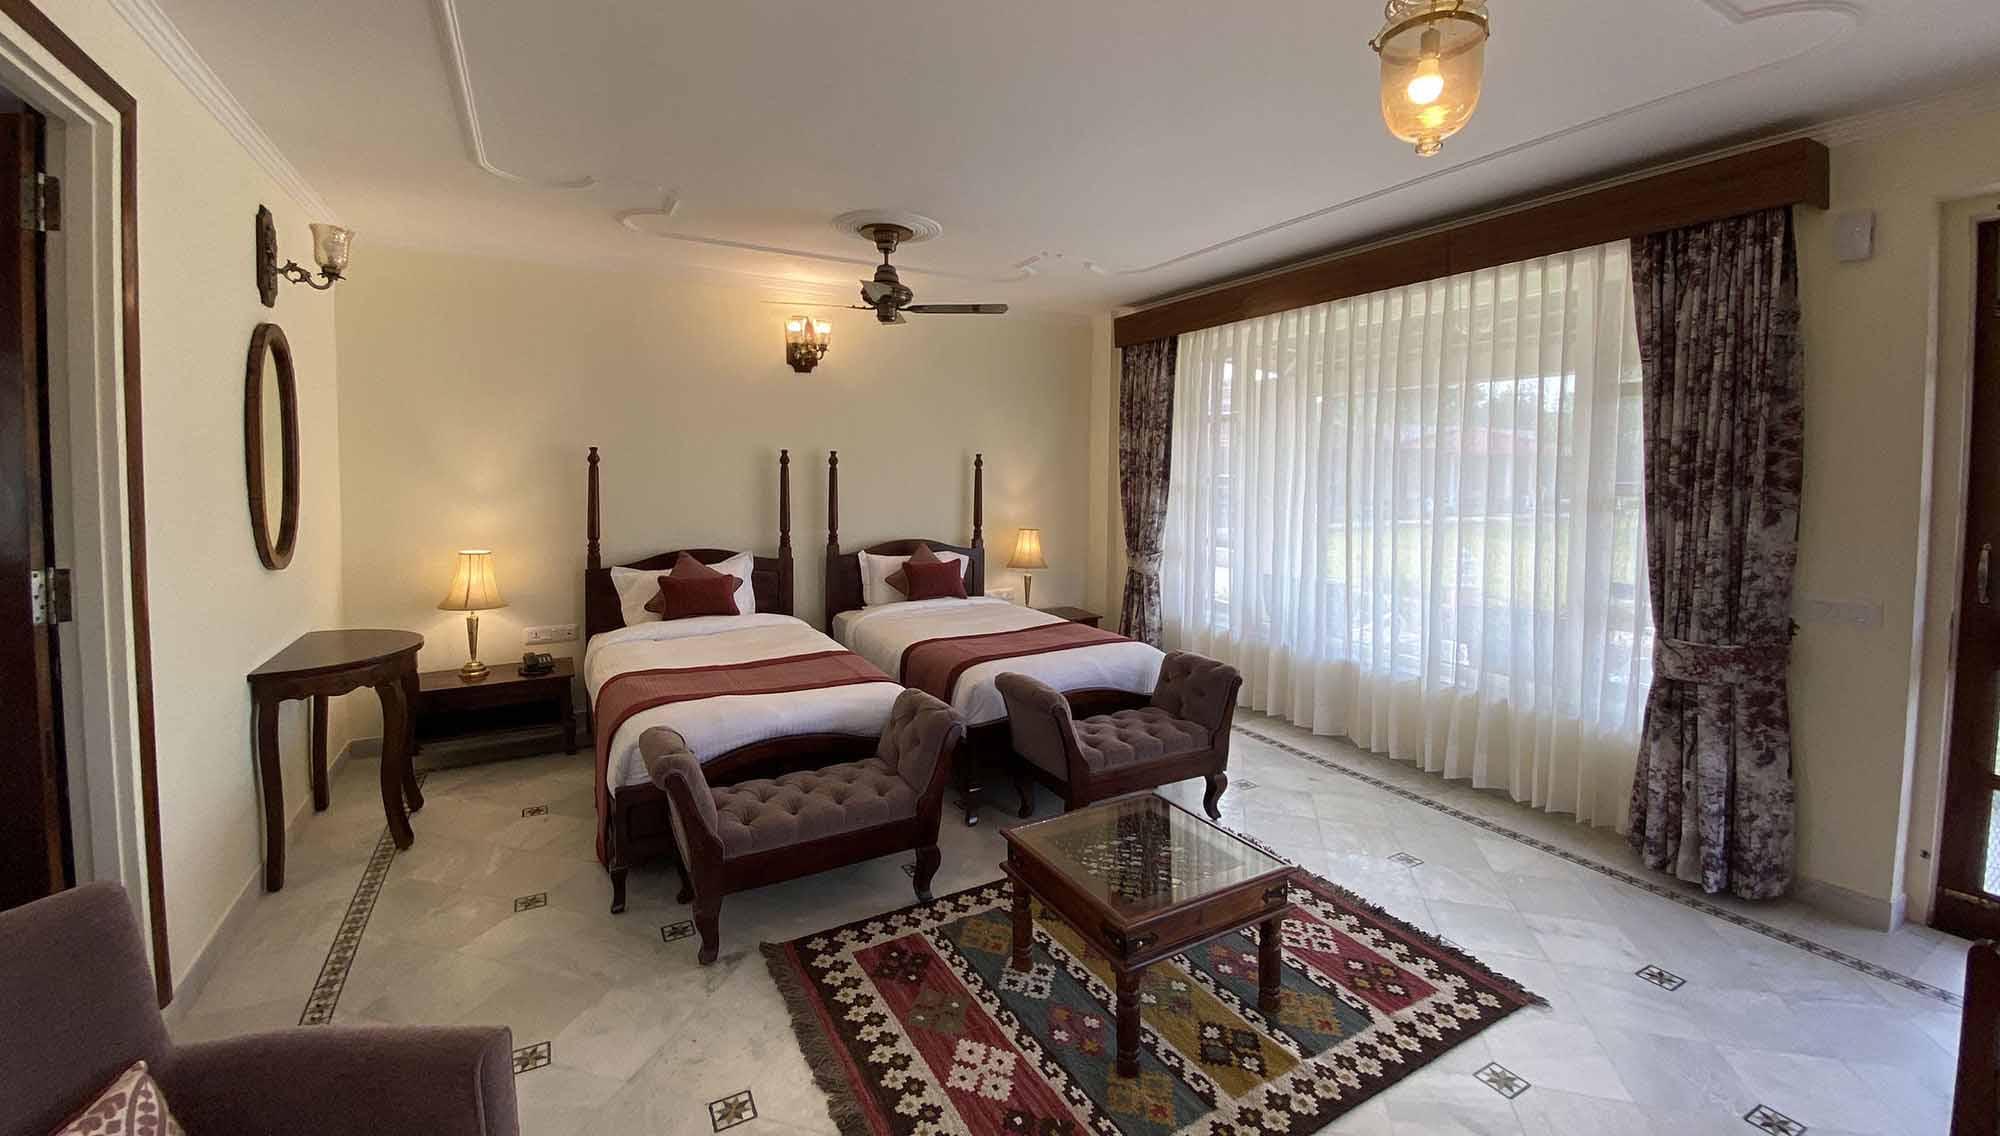 sariska safari lodge room